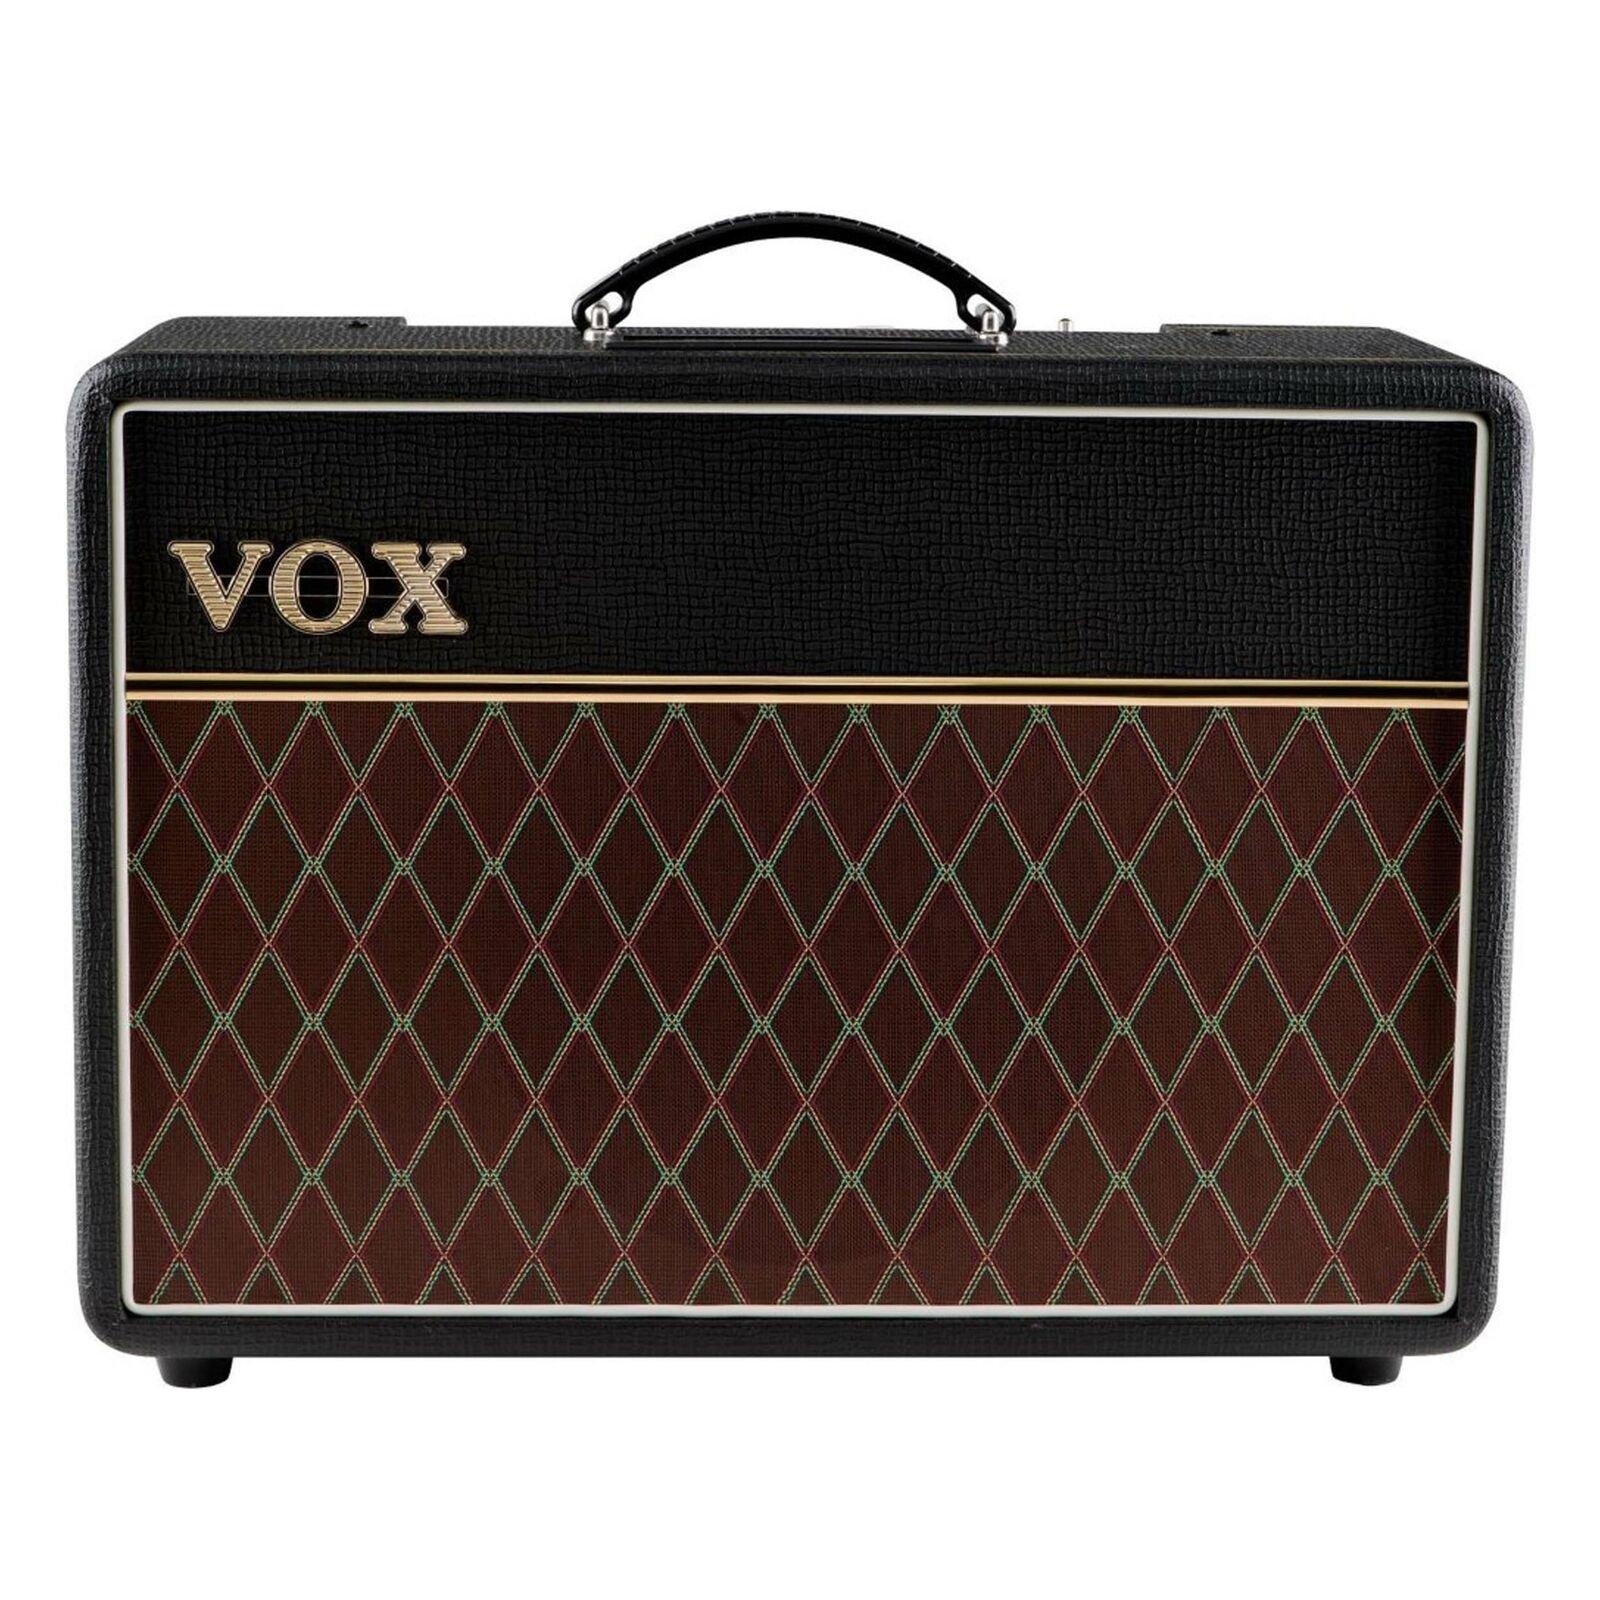 Vox AC10C1 Custom 1x10 10W Guitar Combo - Black